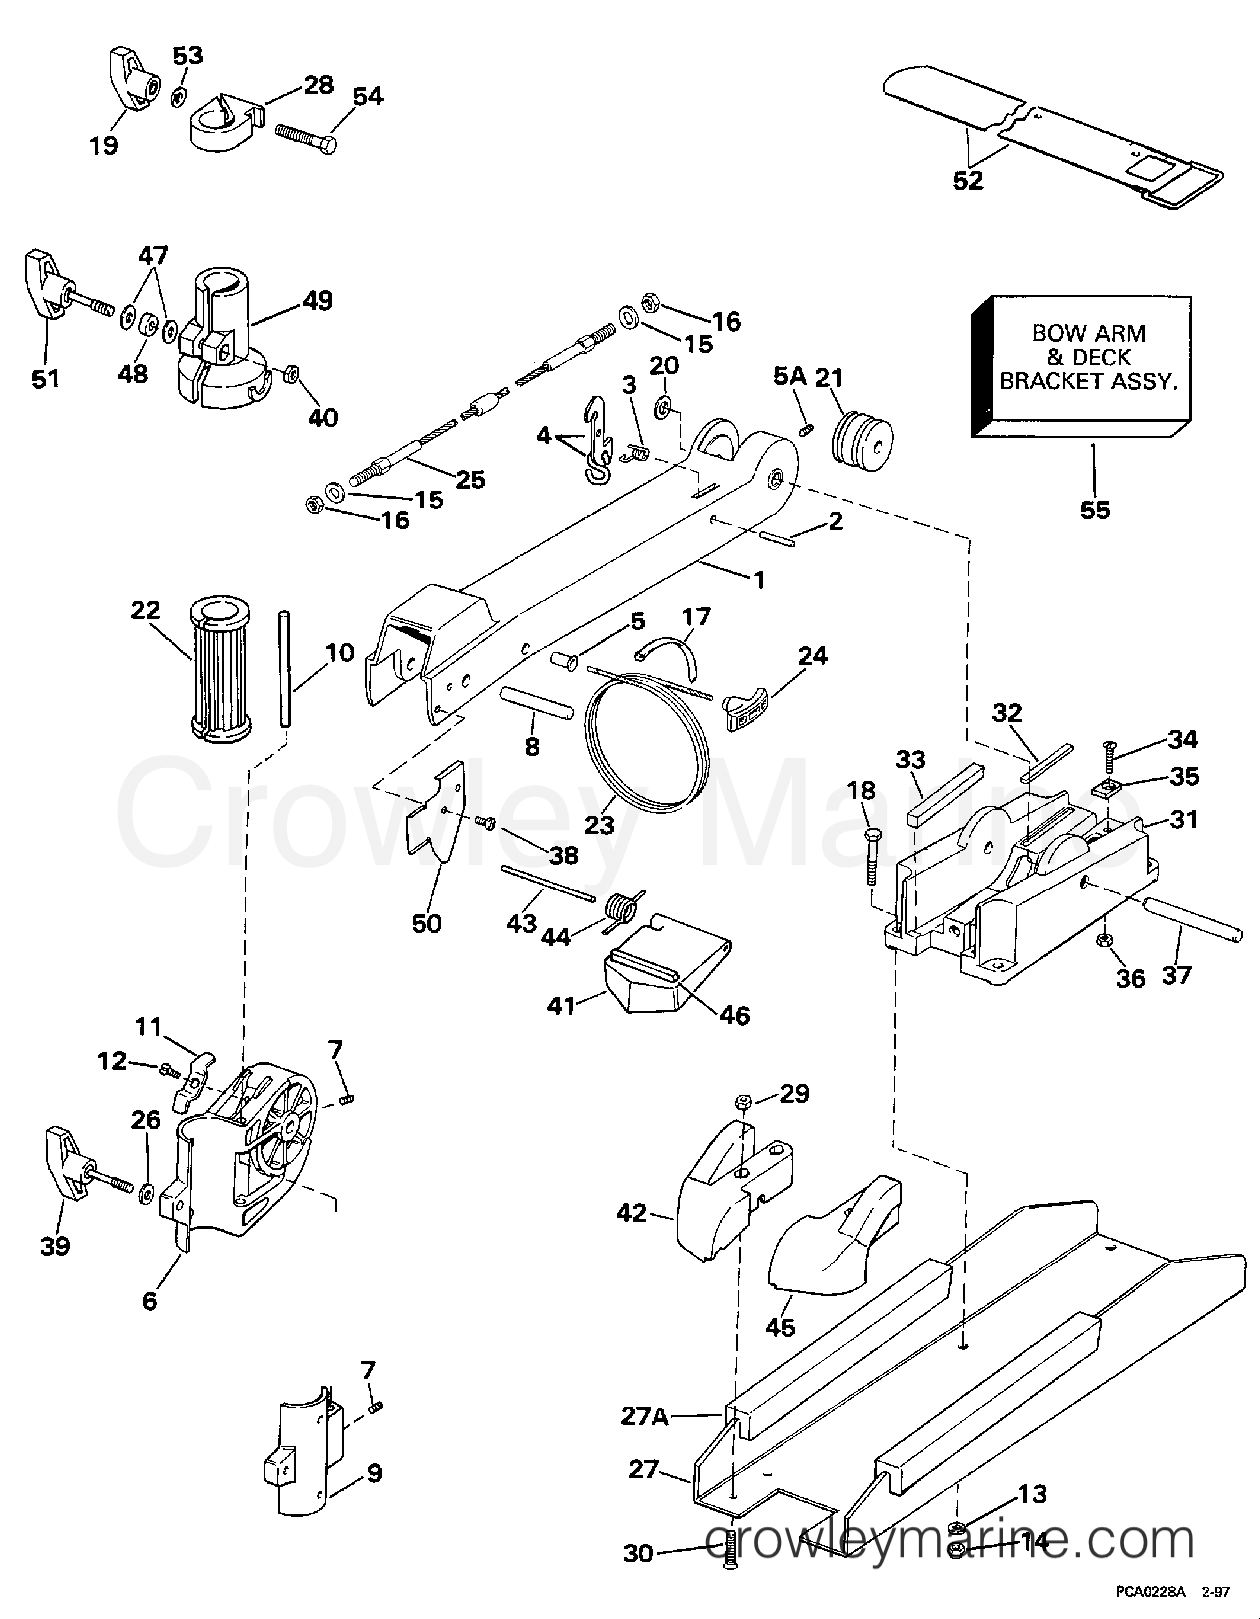 1997 Electric Motors 24 Volt - BFX4TPV - BOW ARM & DECK BRACKET GROUP